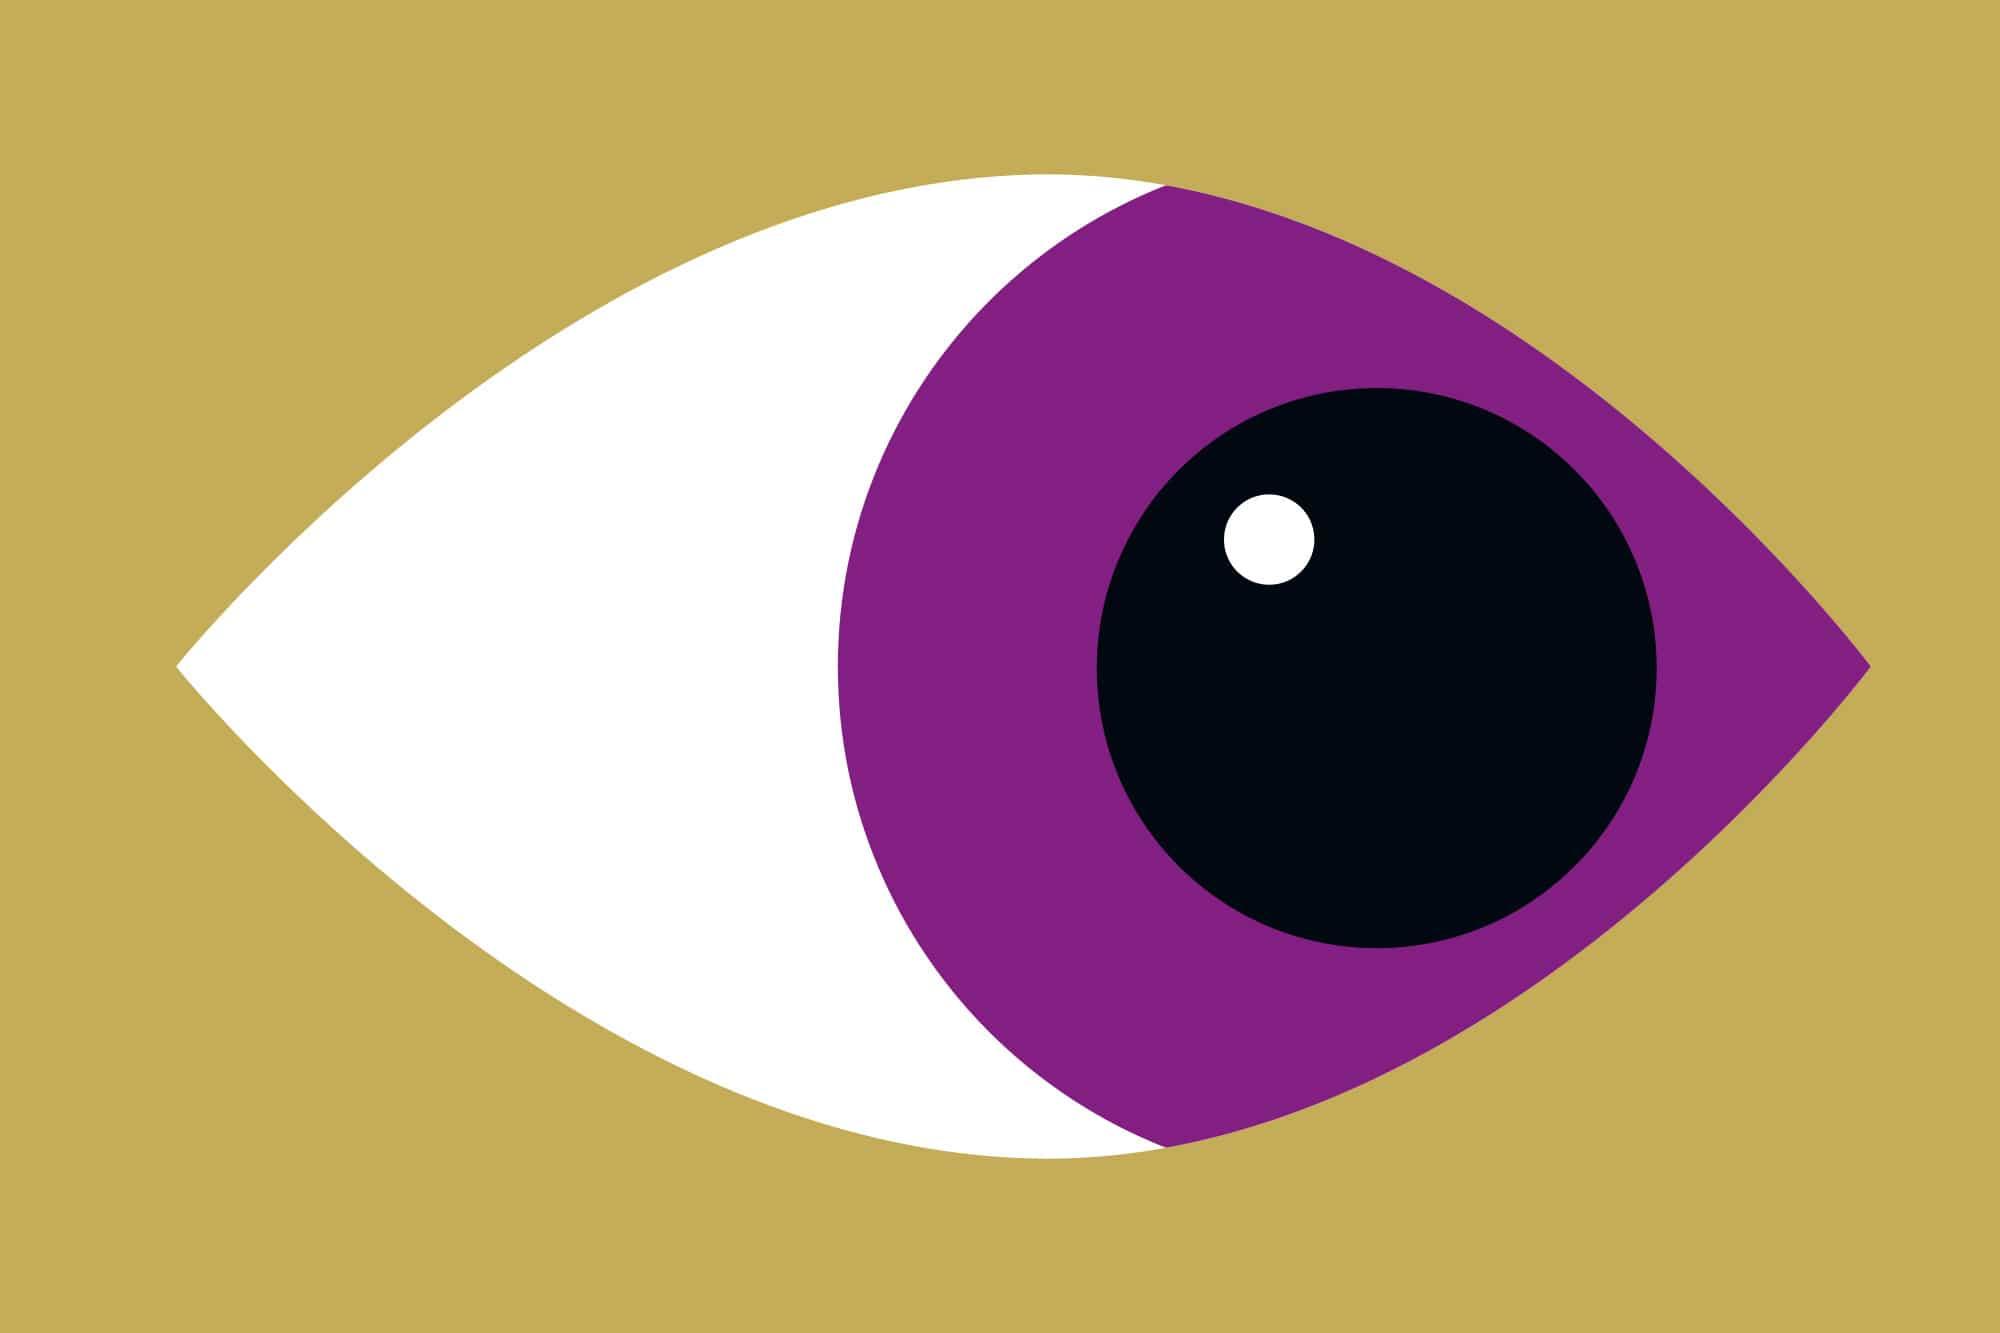 planx-IFTF-Auge